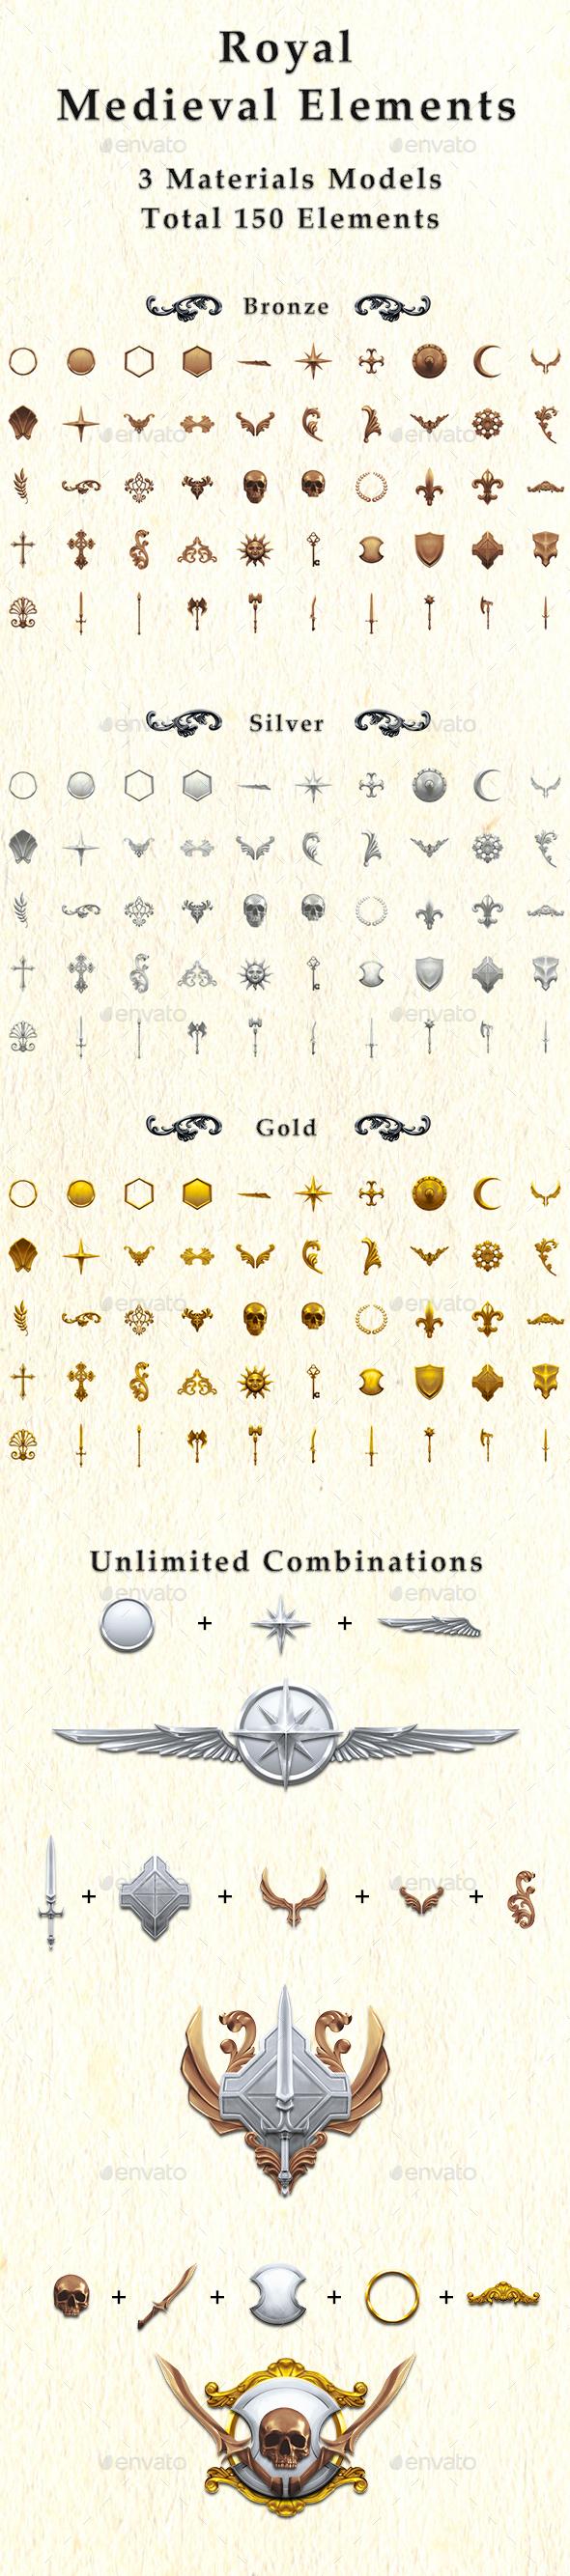 Royal Medieval Elements - Miscellaneous Web Elements